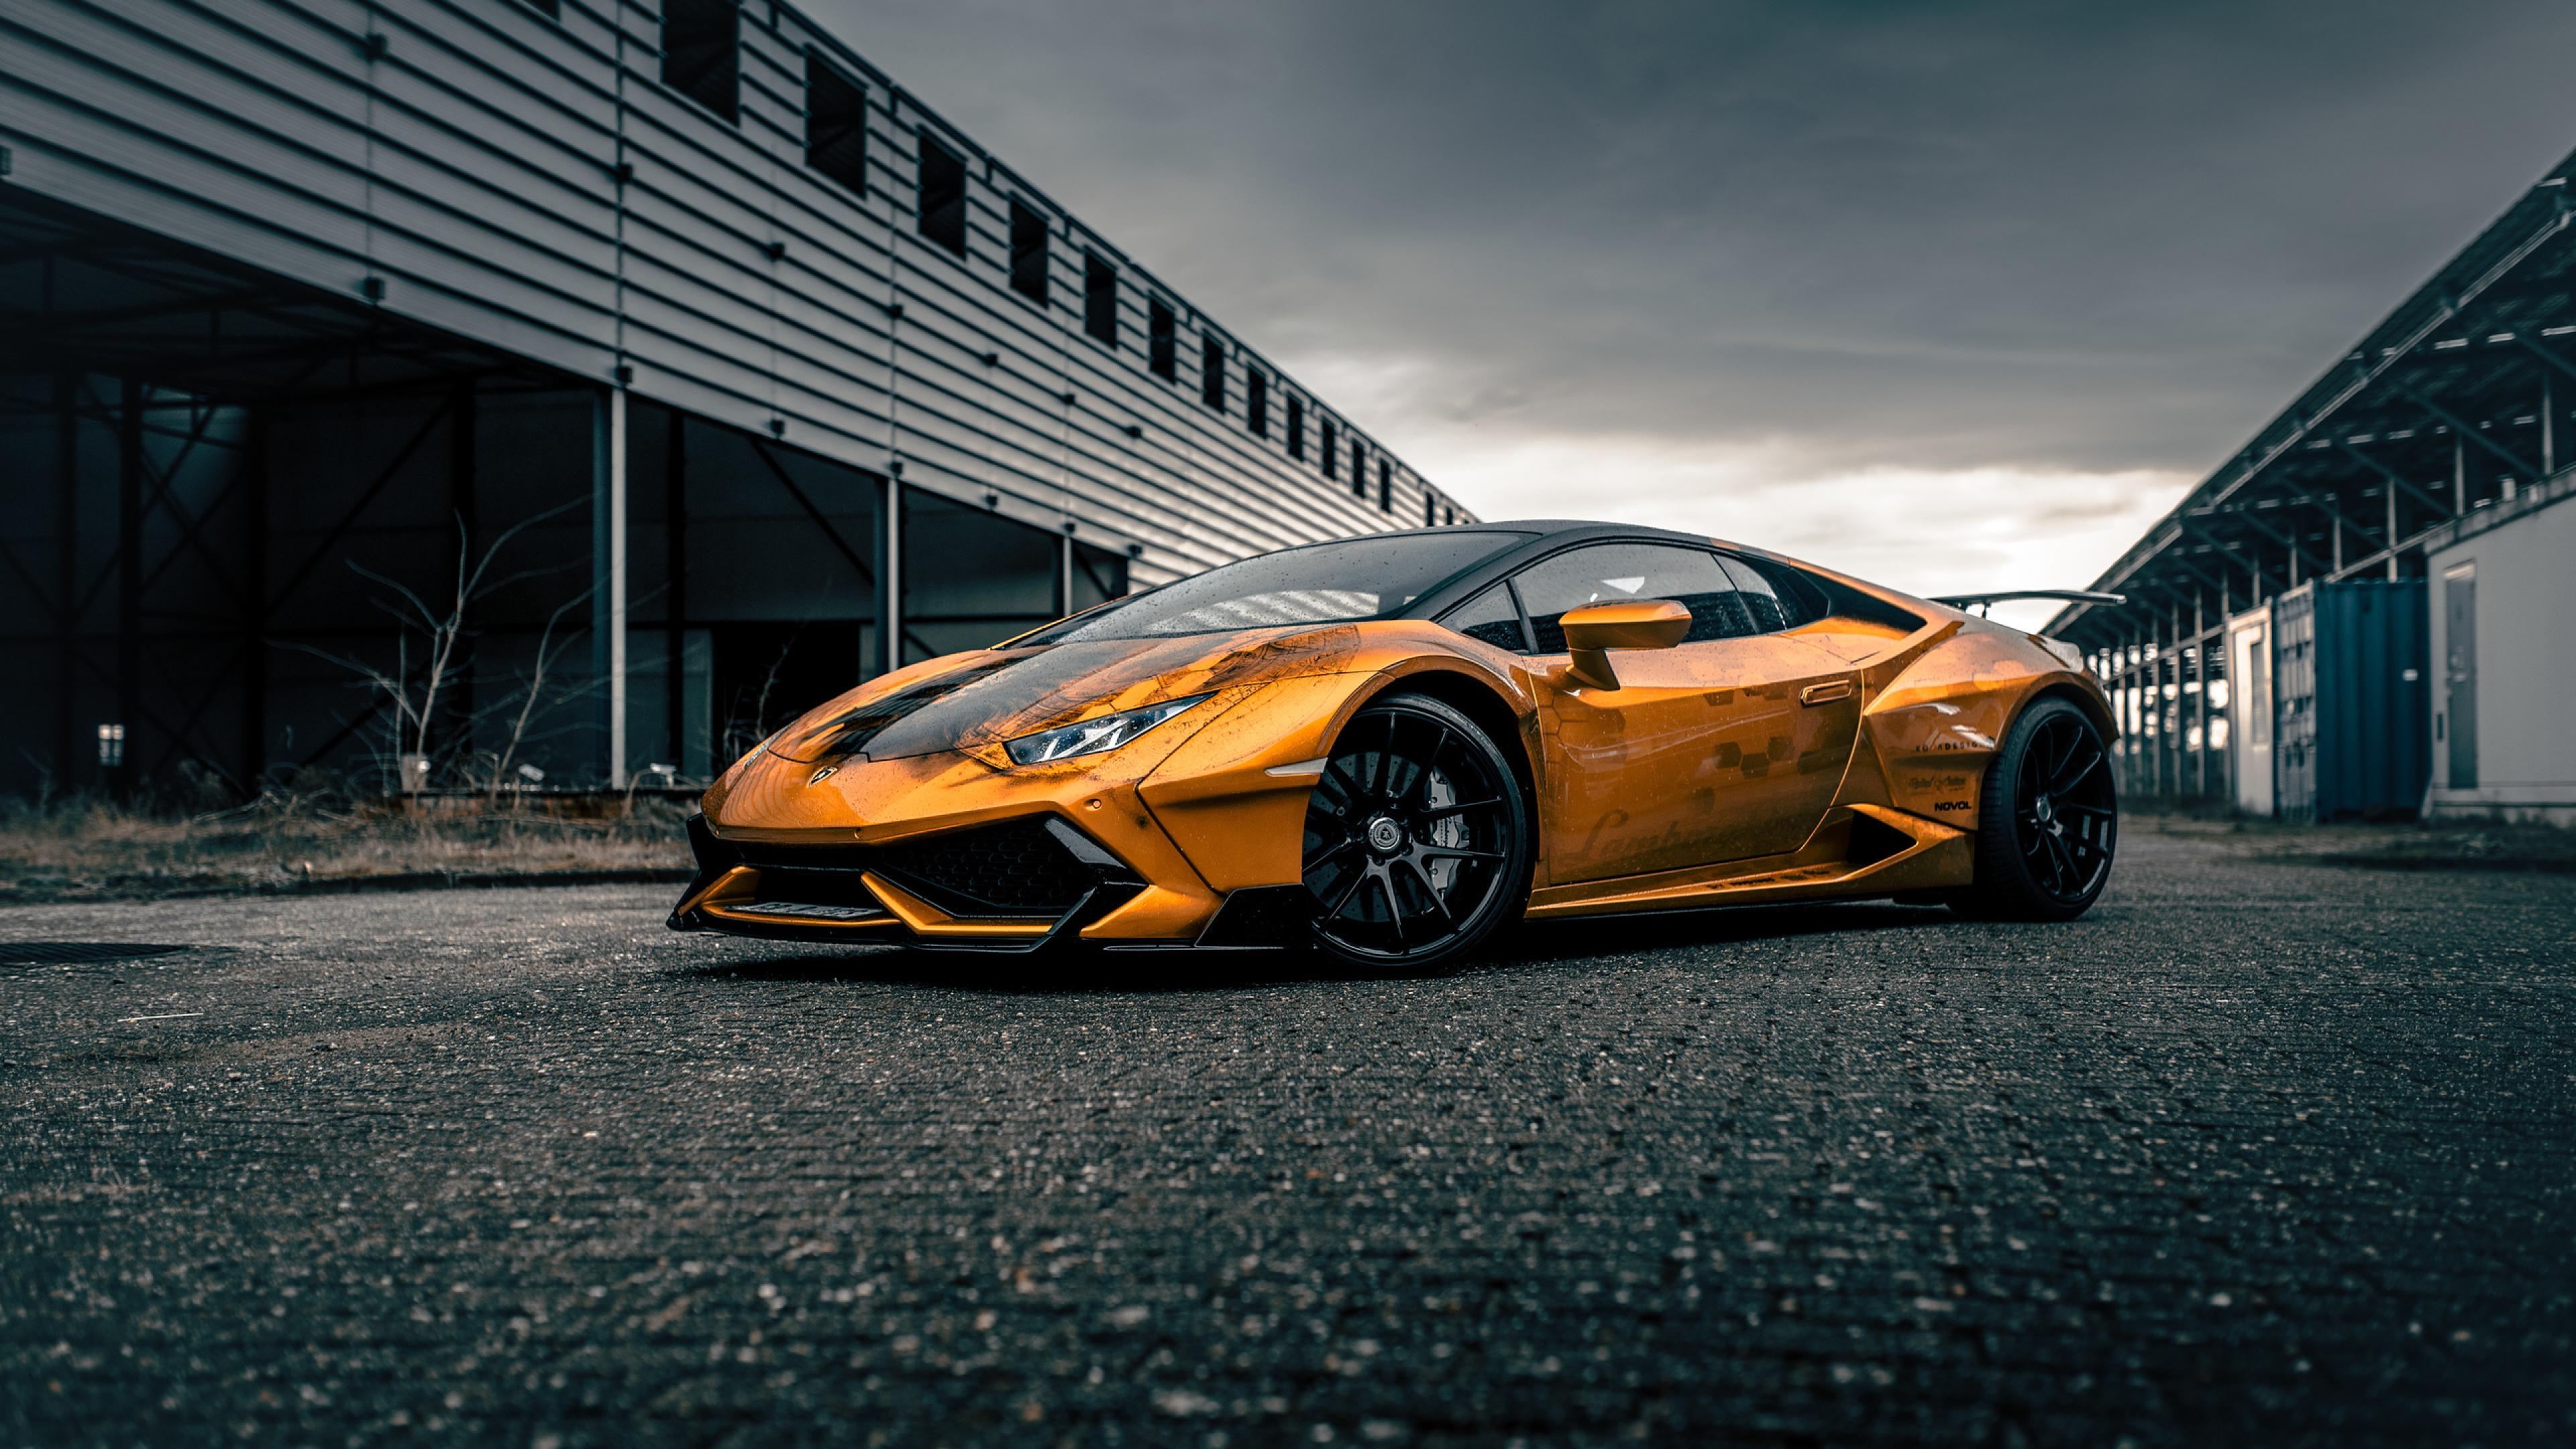 3840x2160 Lamborghini 4K Wallpaper, HD Cars 4K Wallpapers ...